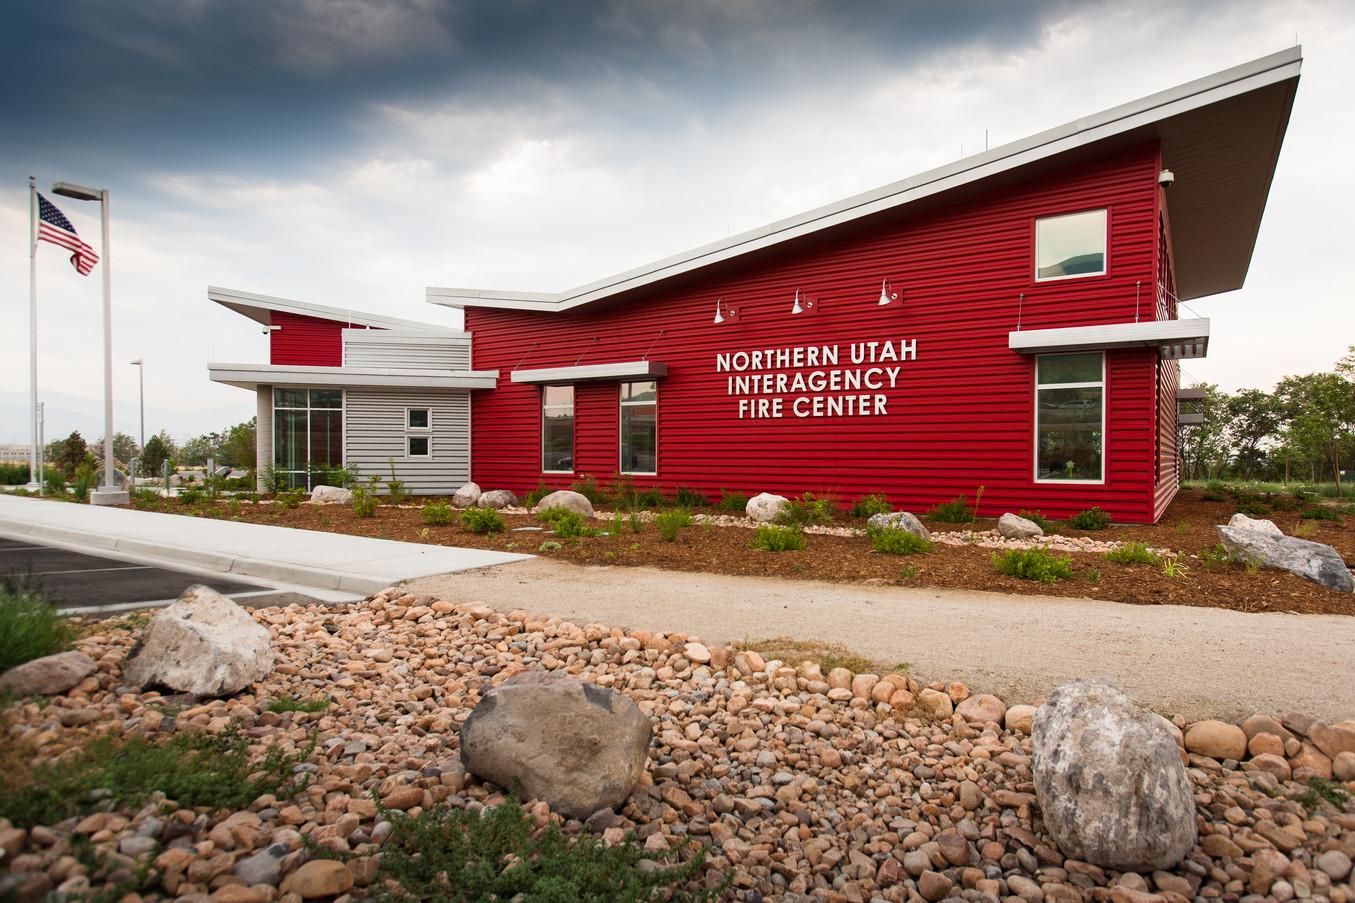 Northern Utah Interagency Fire Center